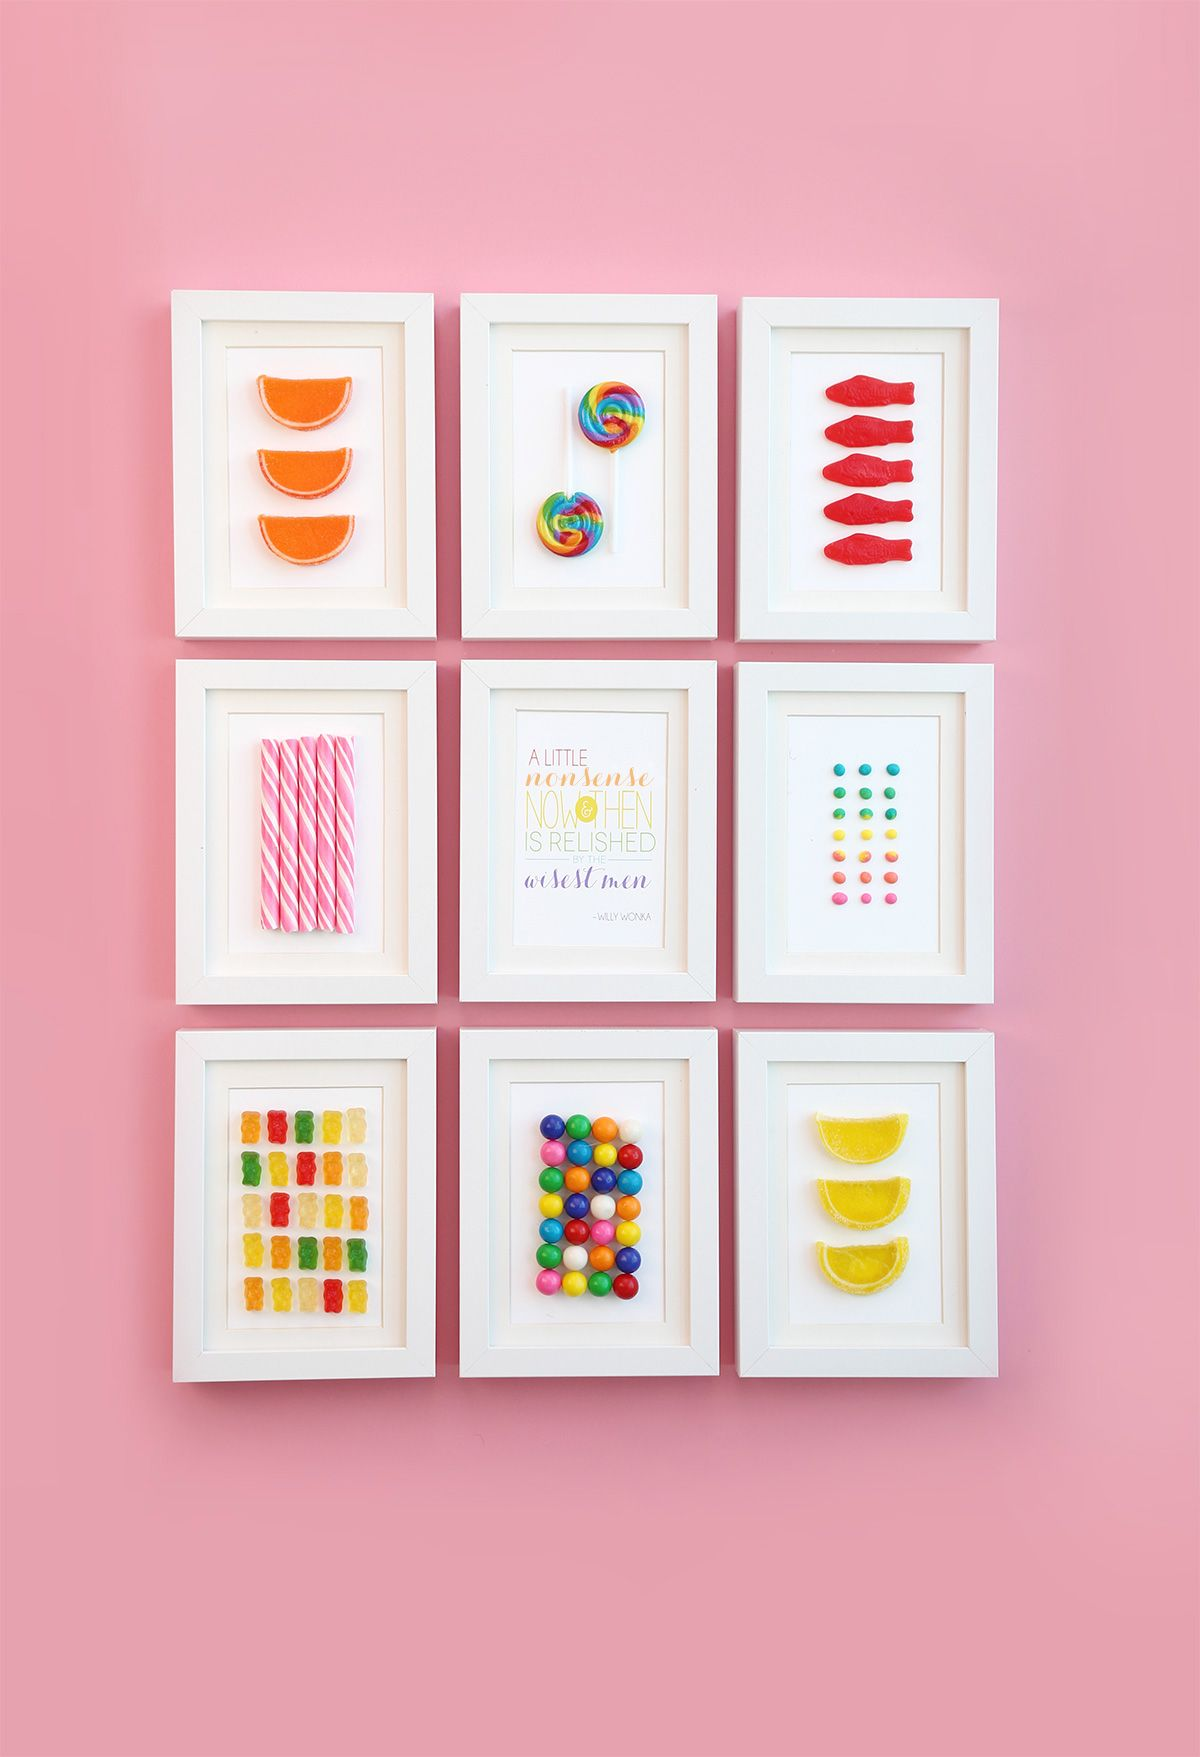 DIY Framed Candy | Home Decor | Pinterest | Diy frame, Candy art and ...